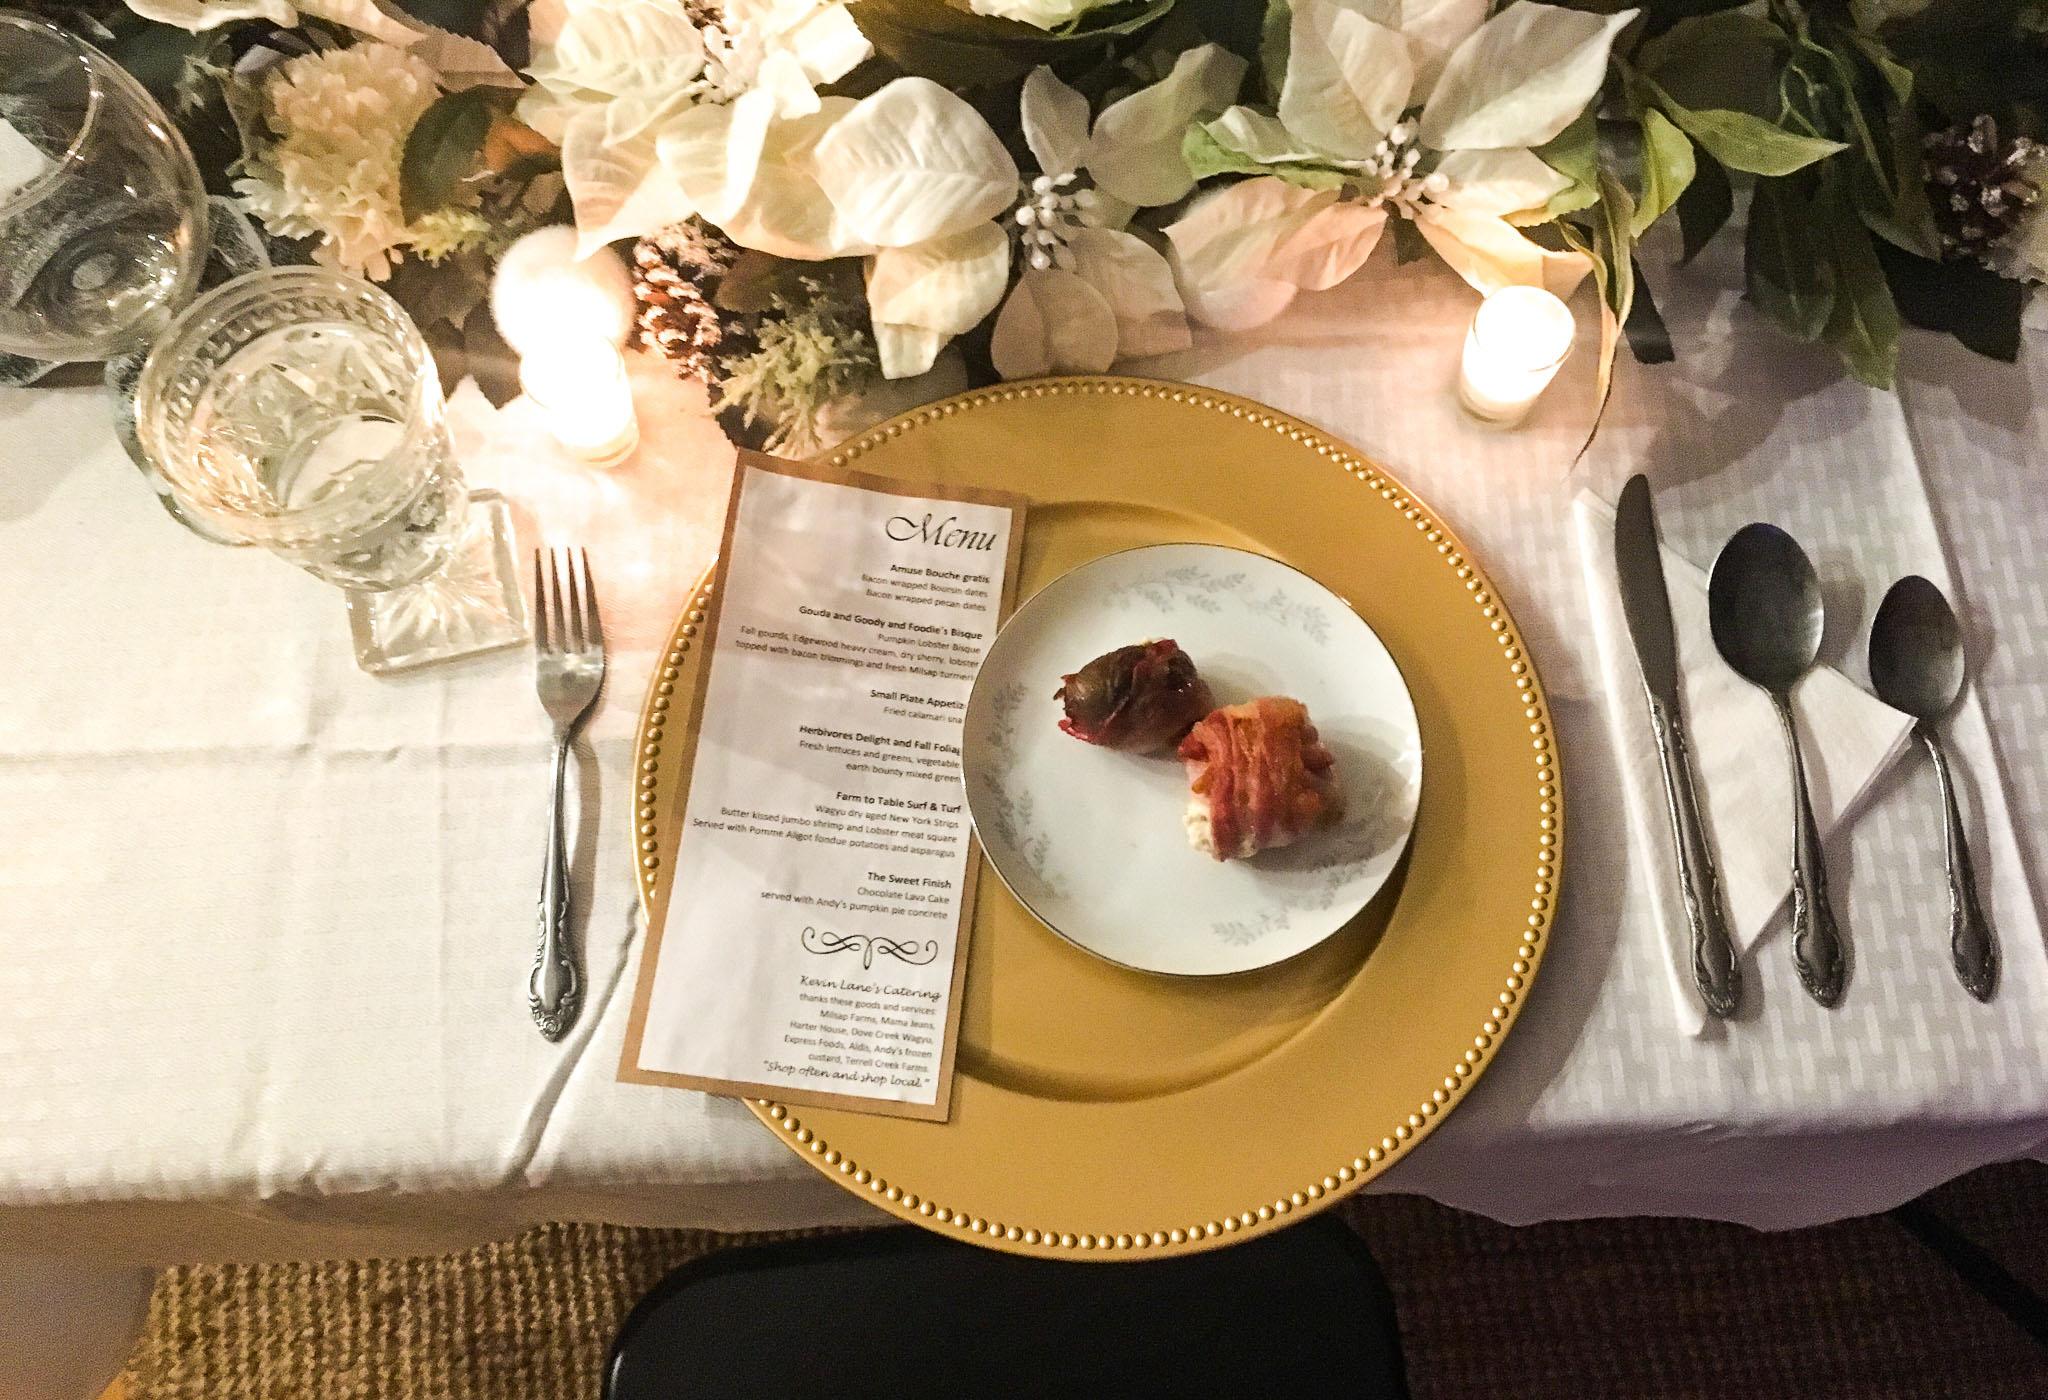 fancy amuse bouche plate with menu